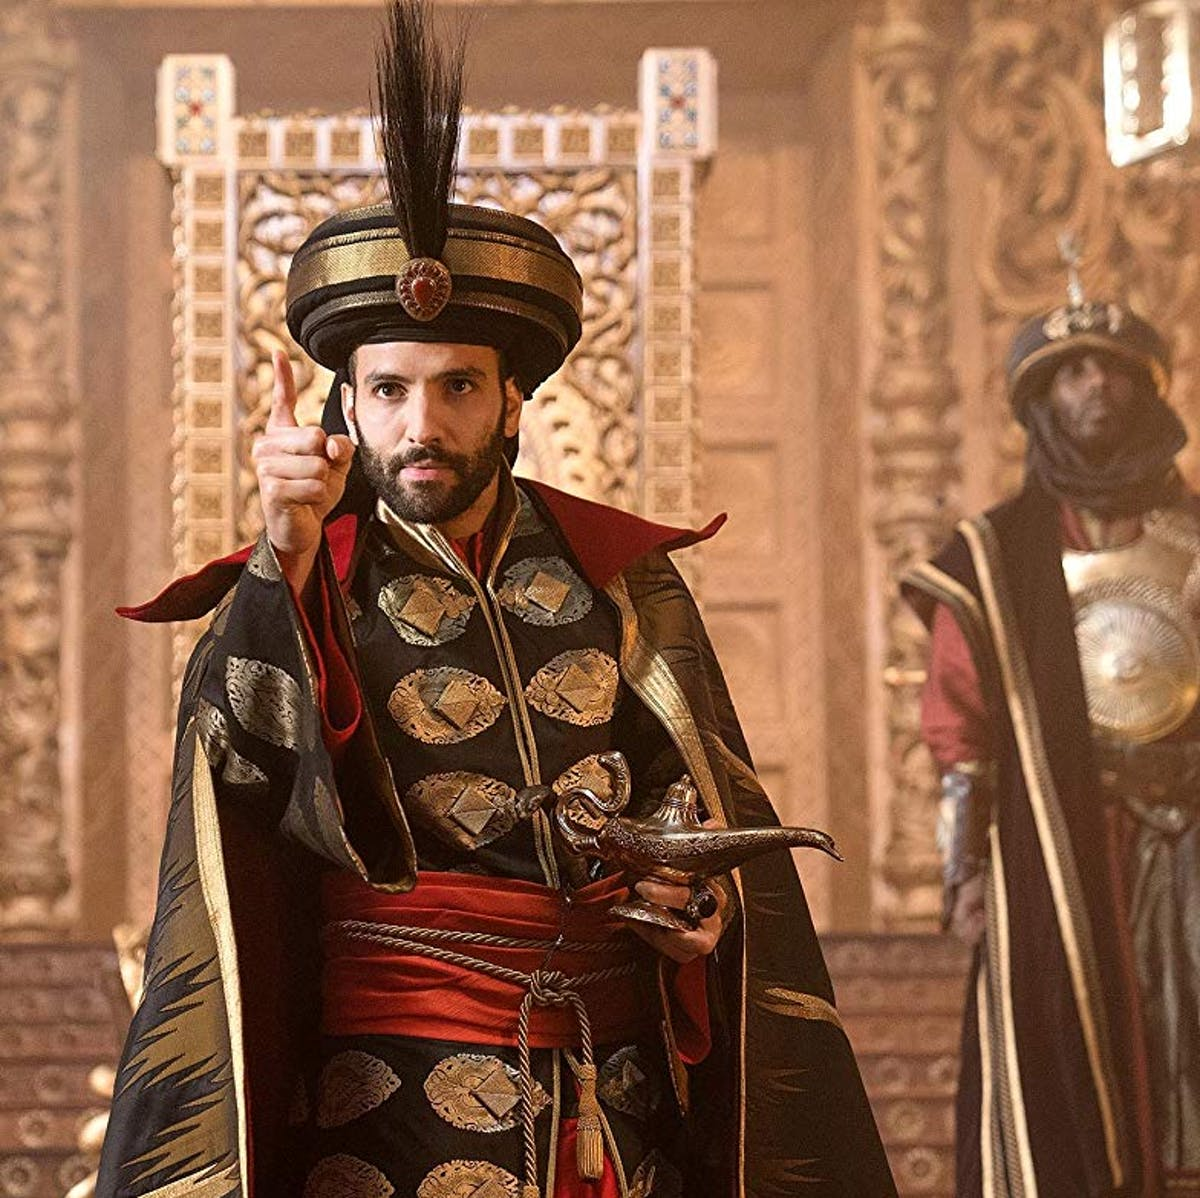 jafar-in-the-new-aladdin-movie